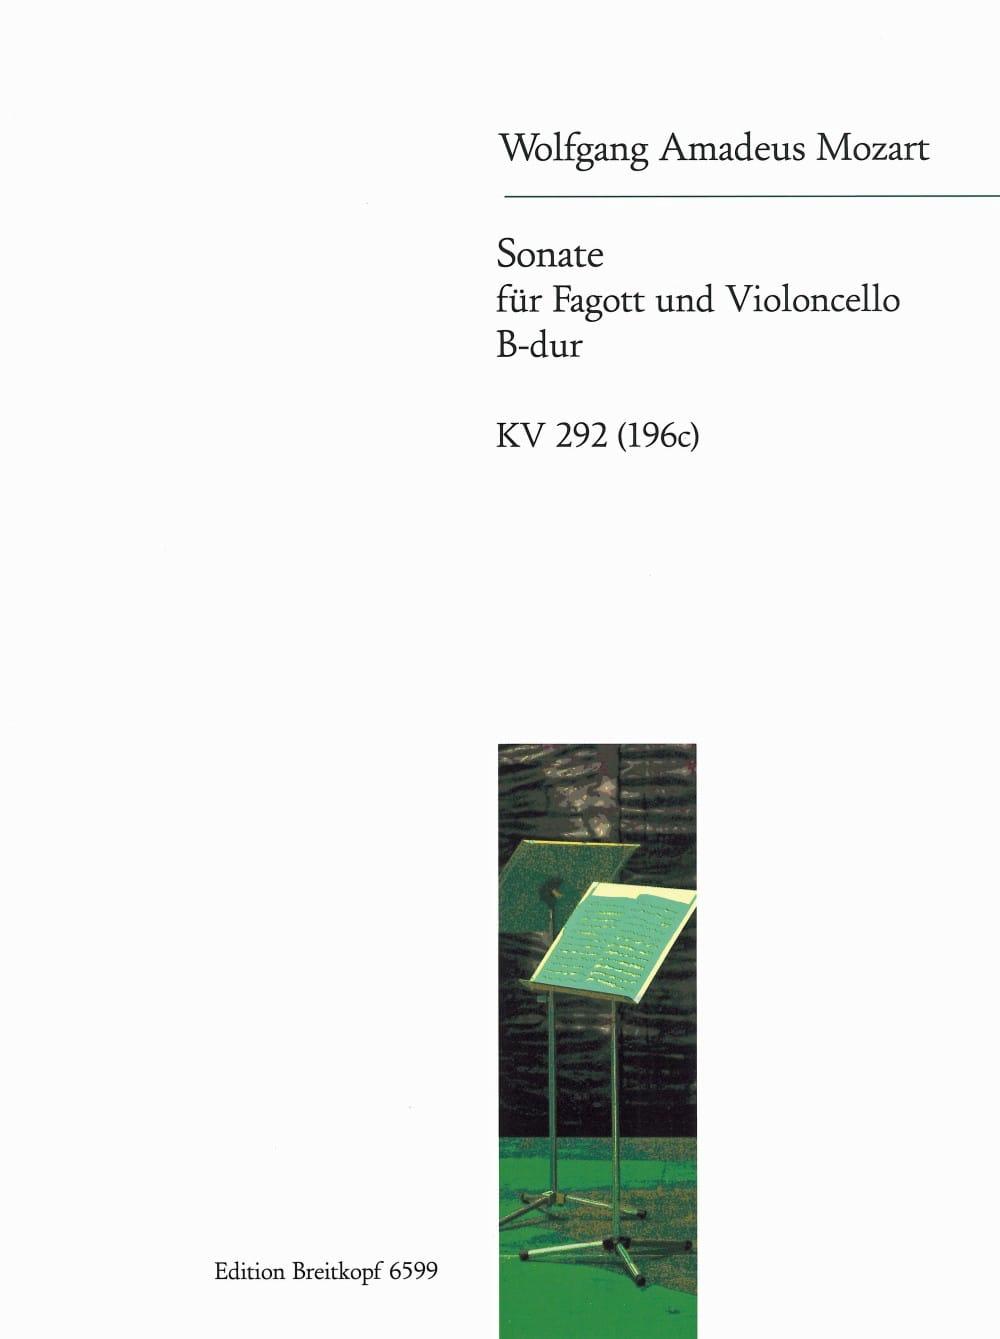 Sonate KV 292 - MOZART - Partition - Duos - laflutedepan.com